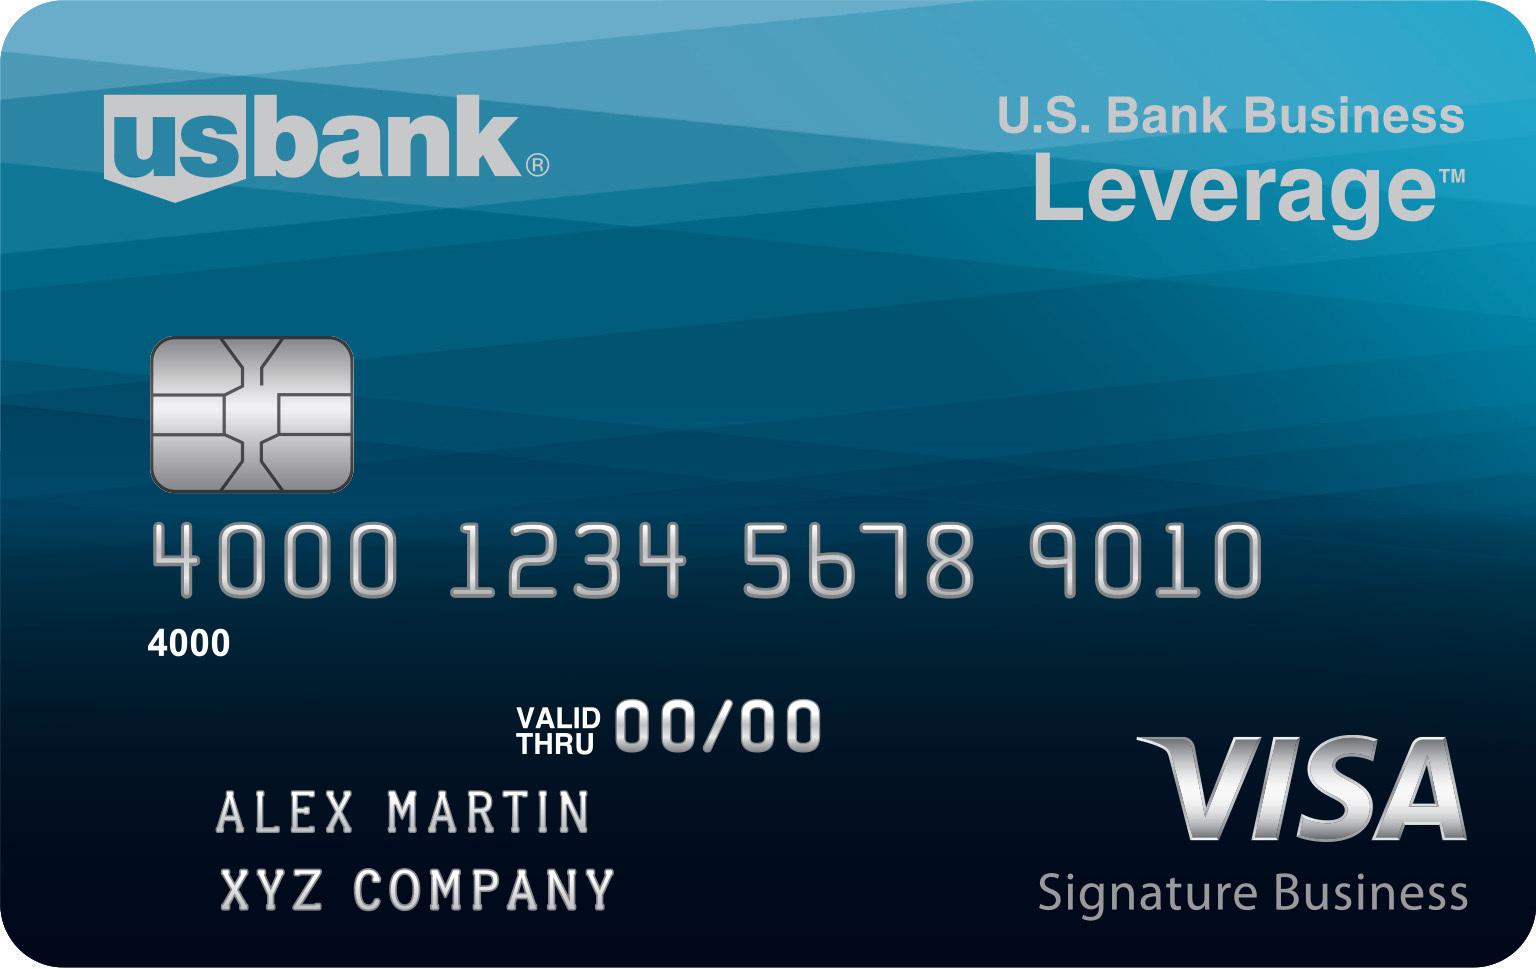 us bank business leverage visa signature - Us Bank Business Credit Card